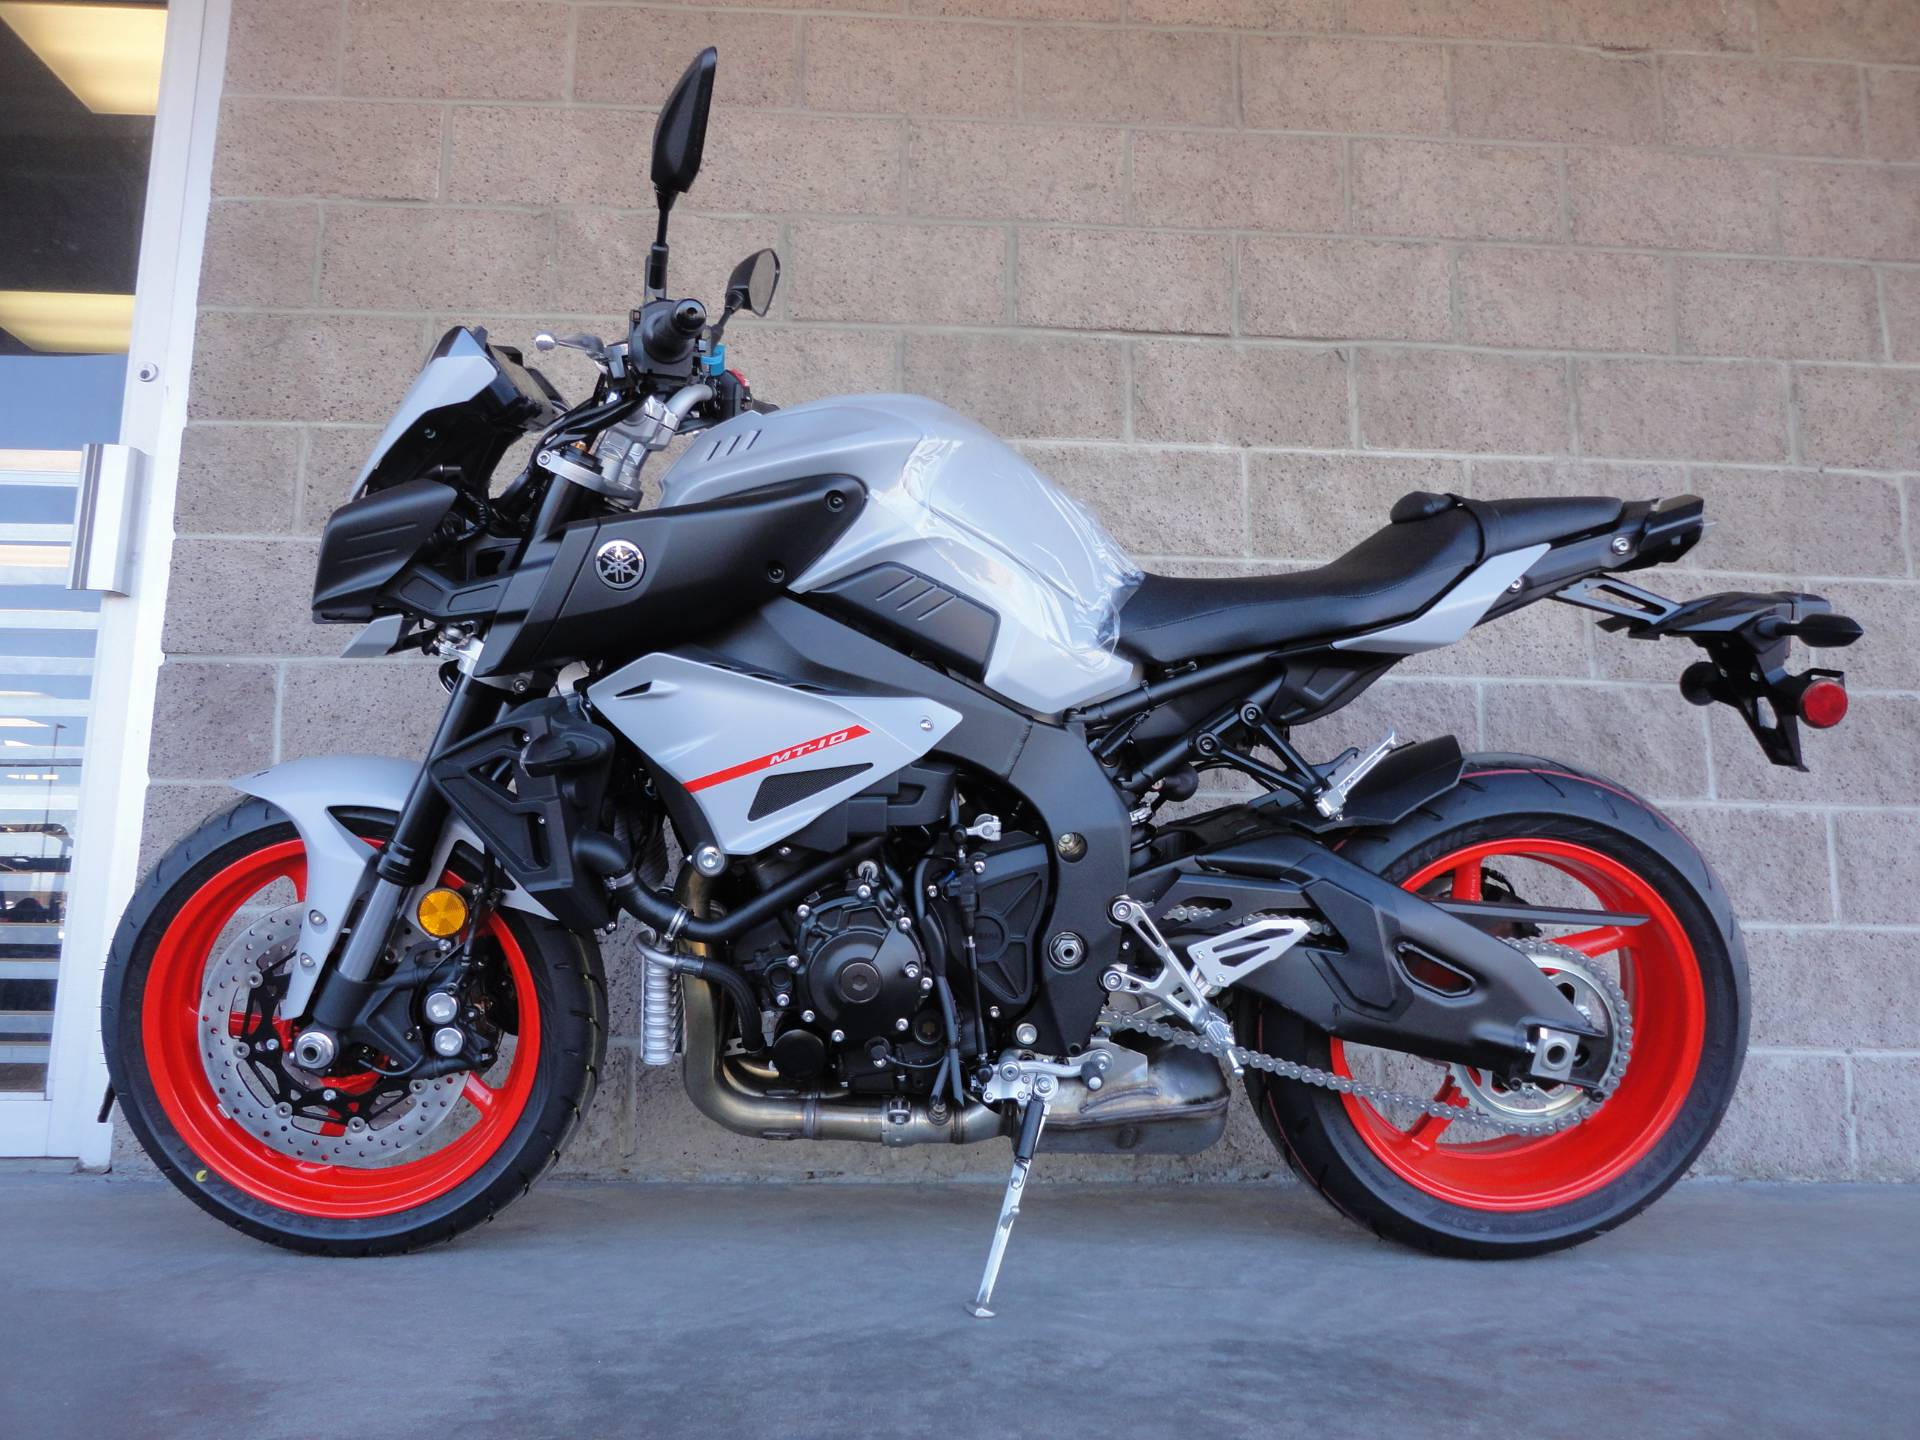 2019 Yamaha MT-10 2